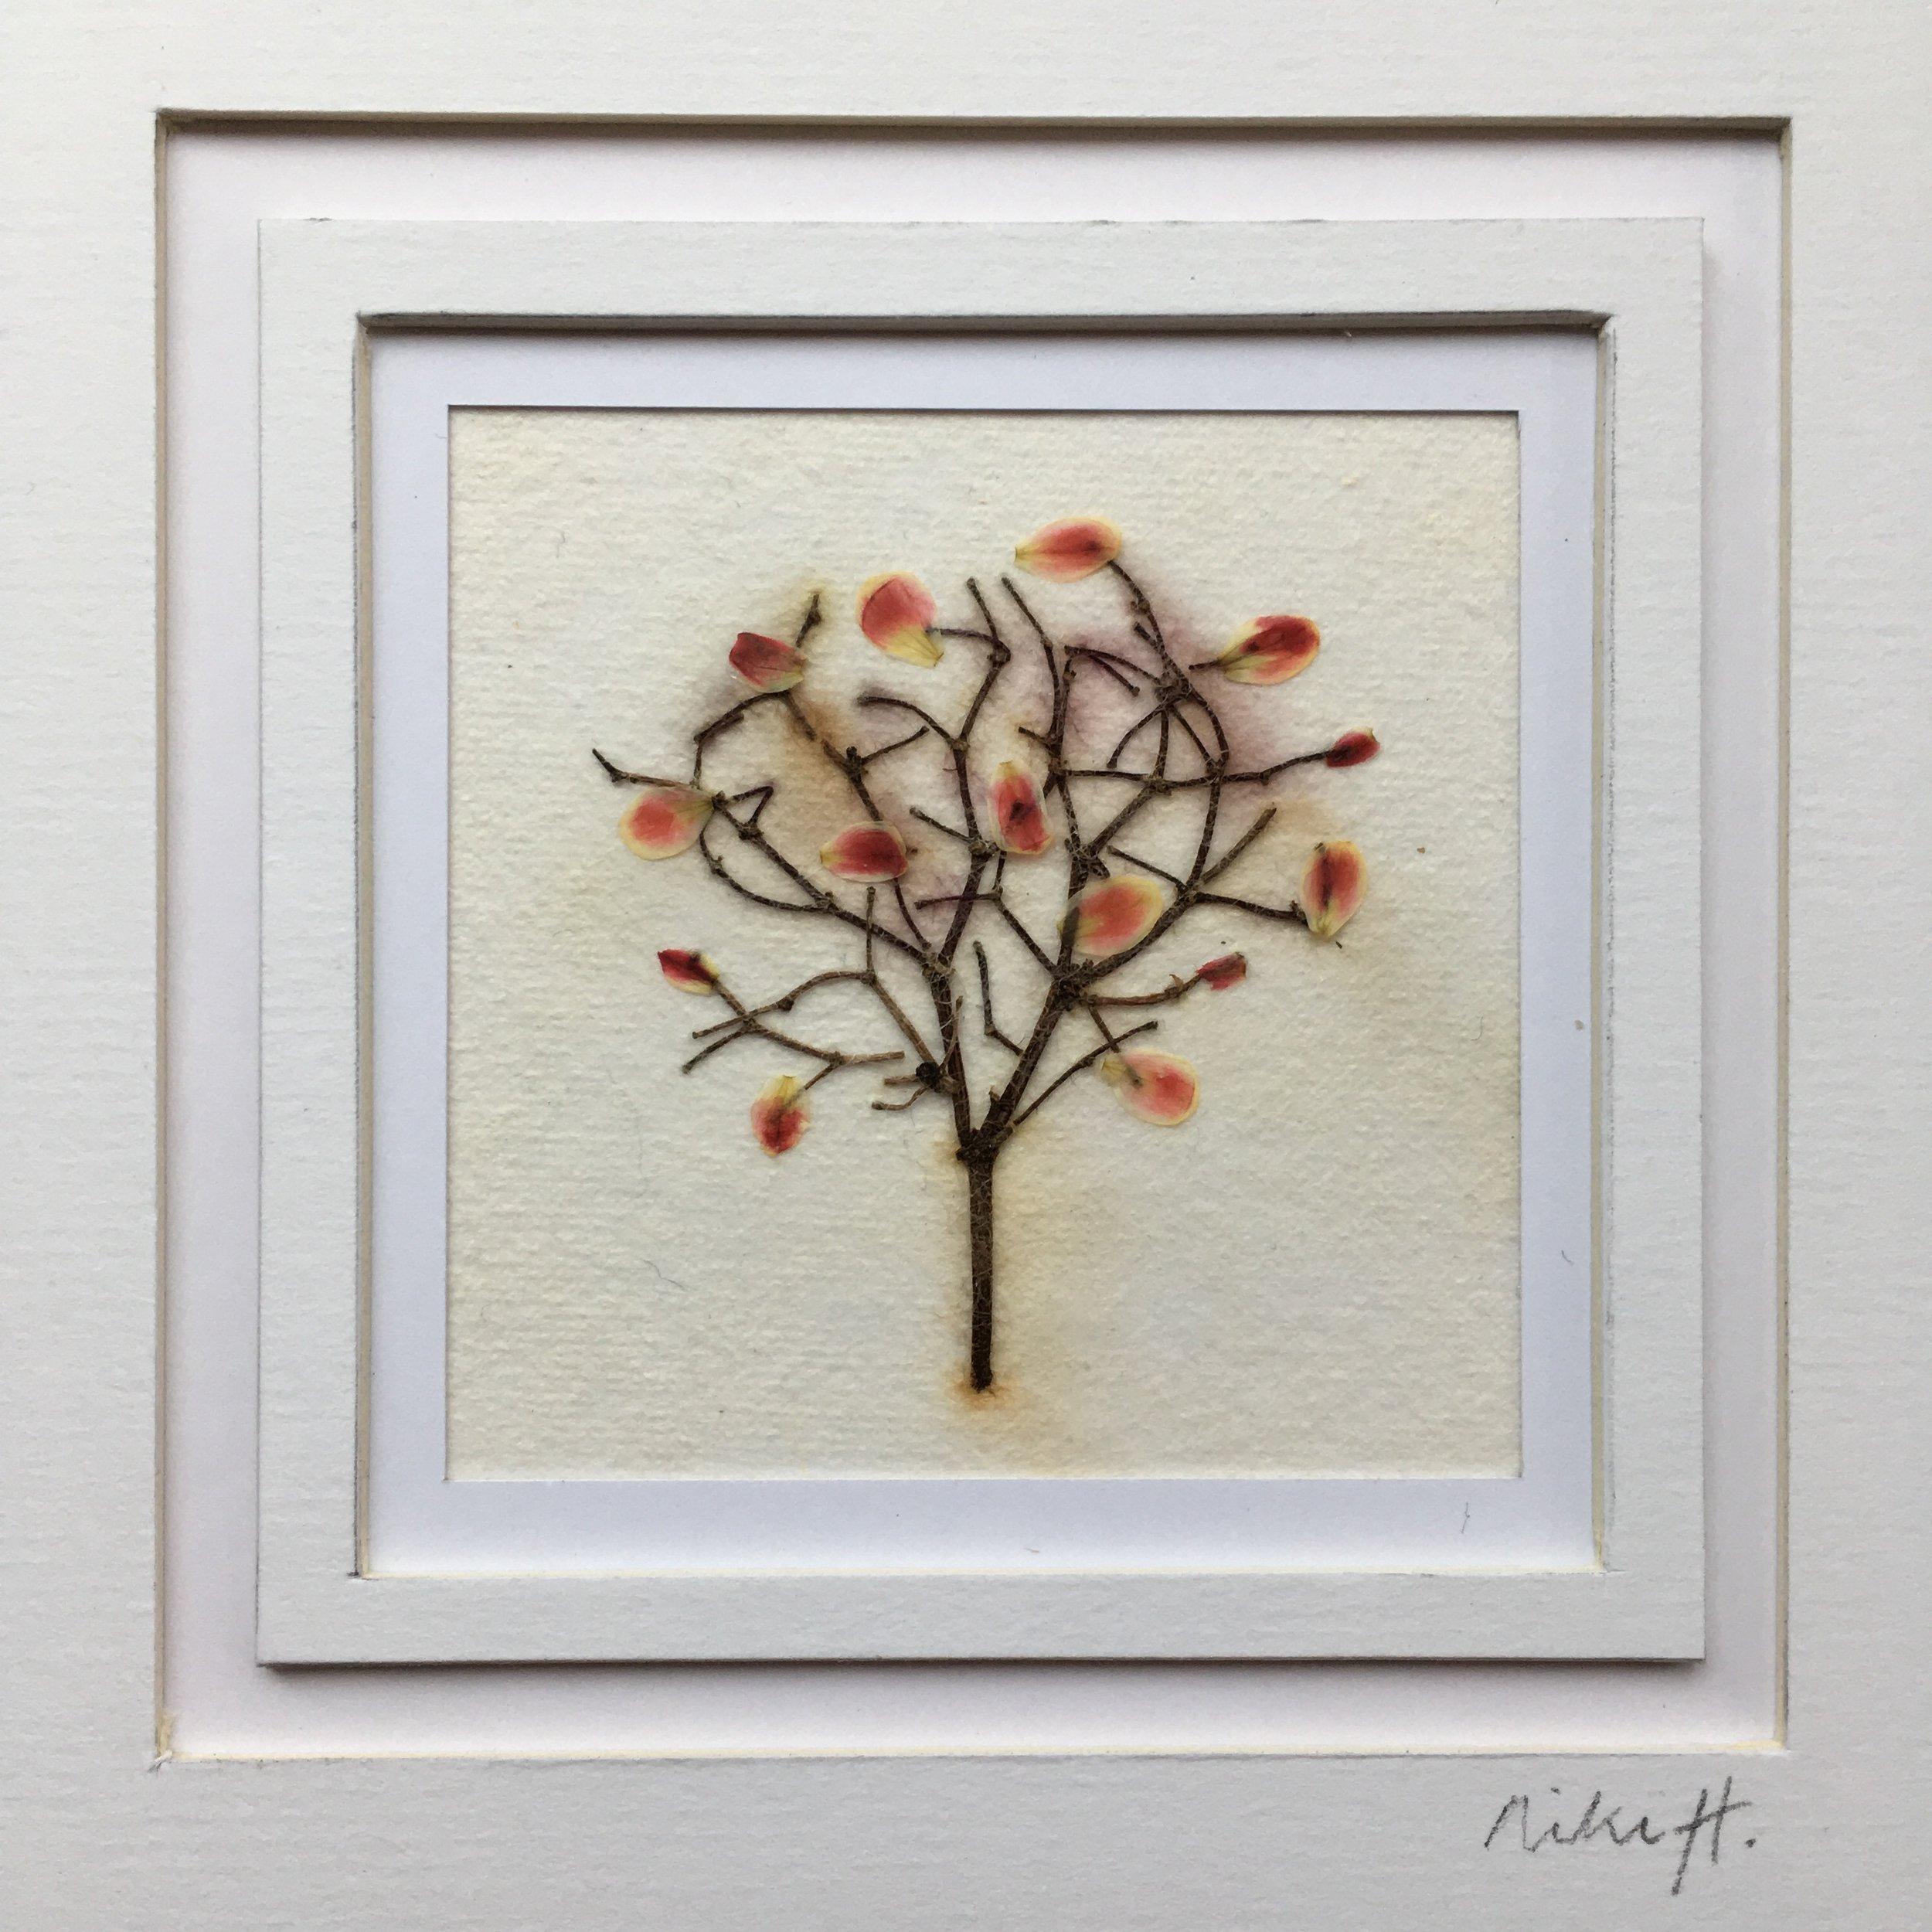 miniature tree picture.jpg